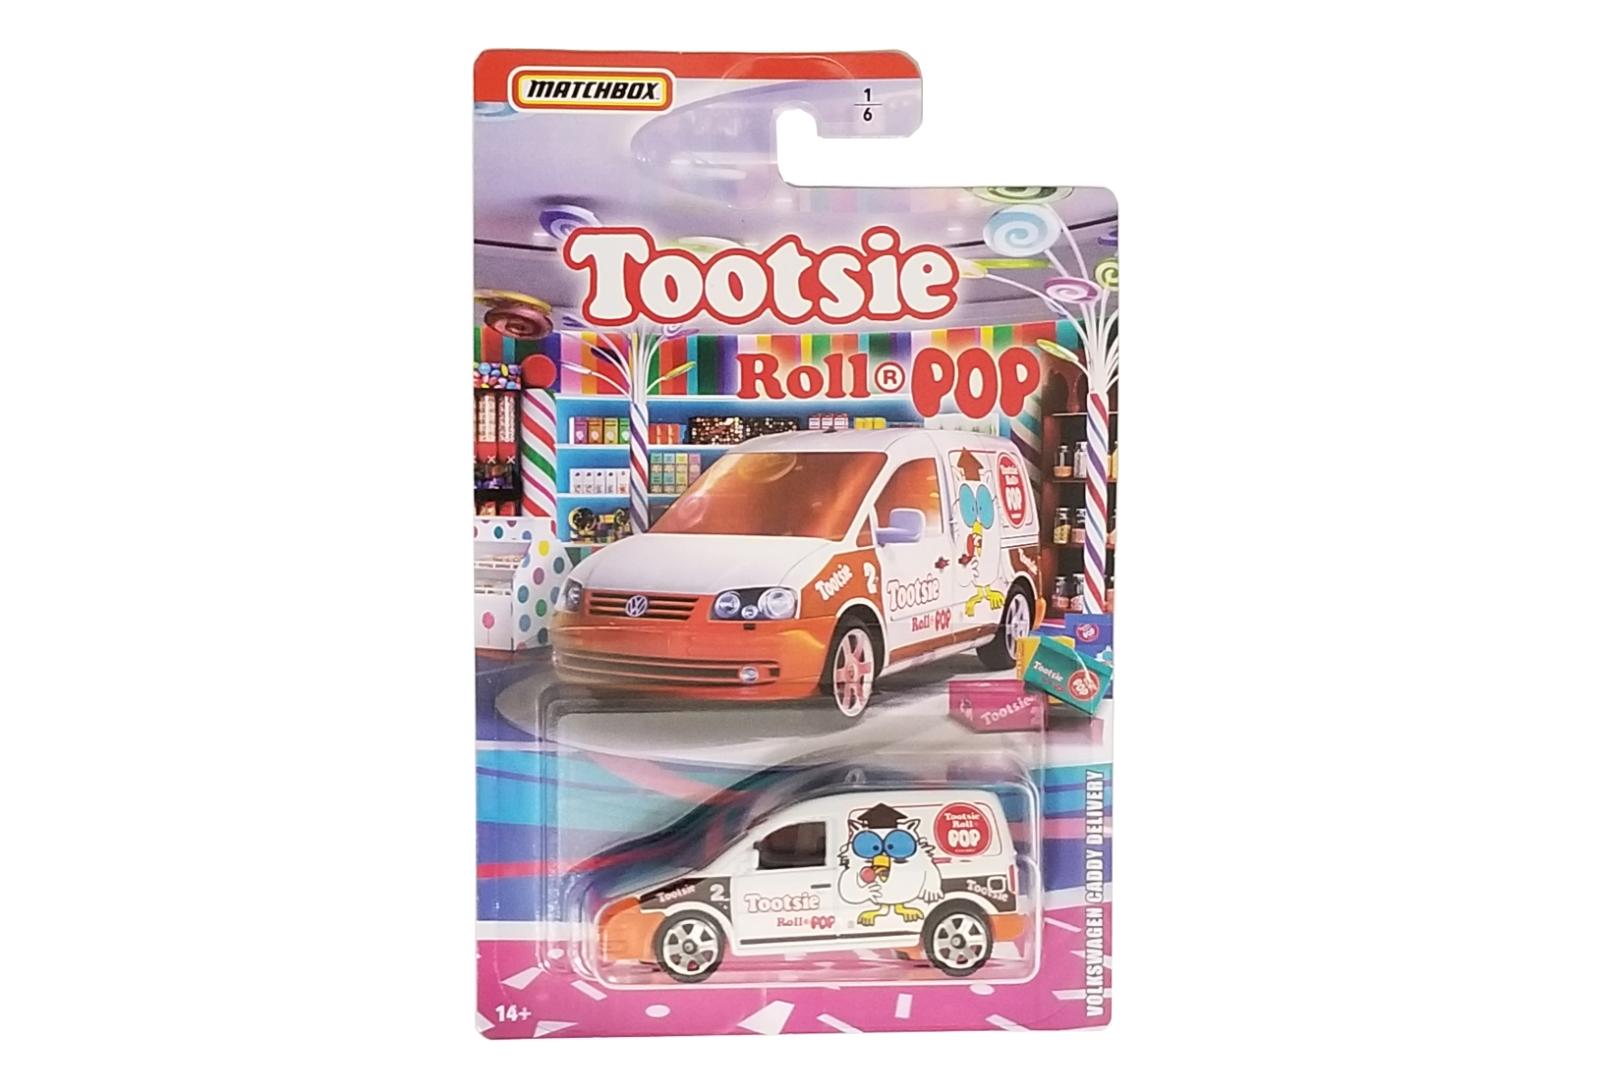 Matchbox 2020 Tootsie Roll Pop Volkswagen Caddy Delivery #1/6 GKP75-4B10